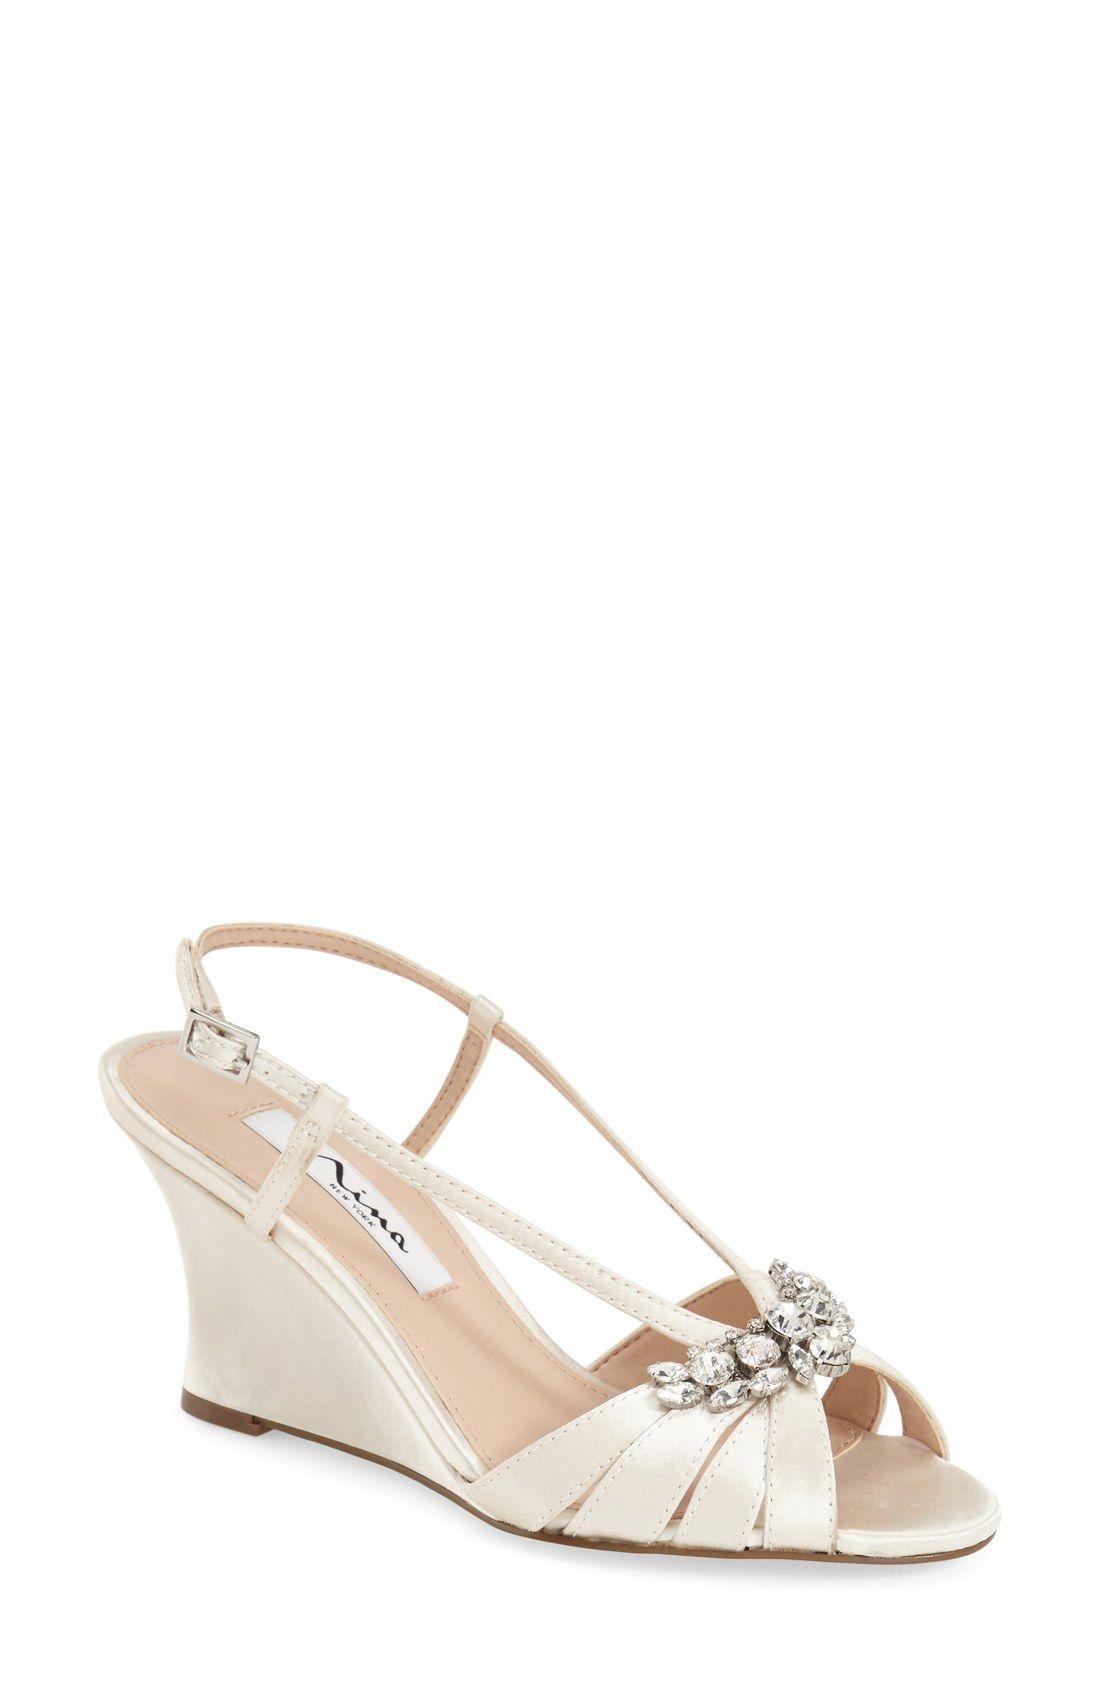 Voleta\' Wedge Sandal | Wedge sandals, Wedding accessories and ...